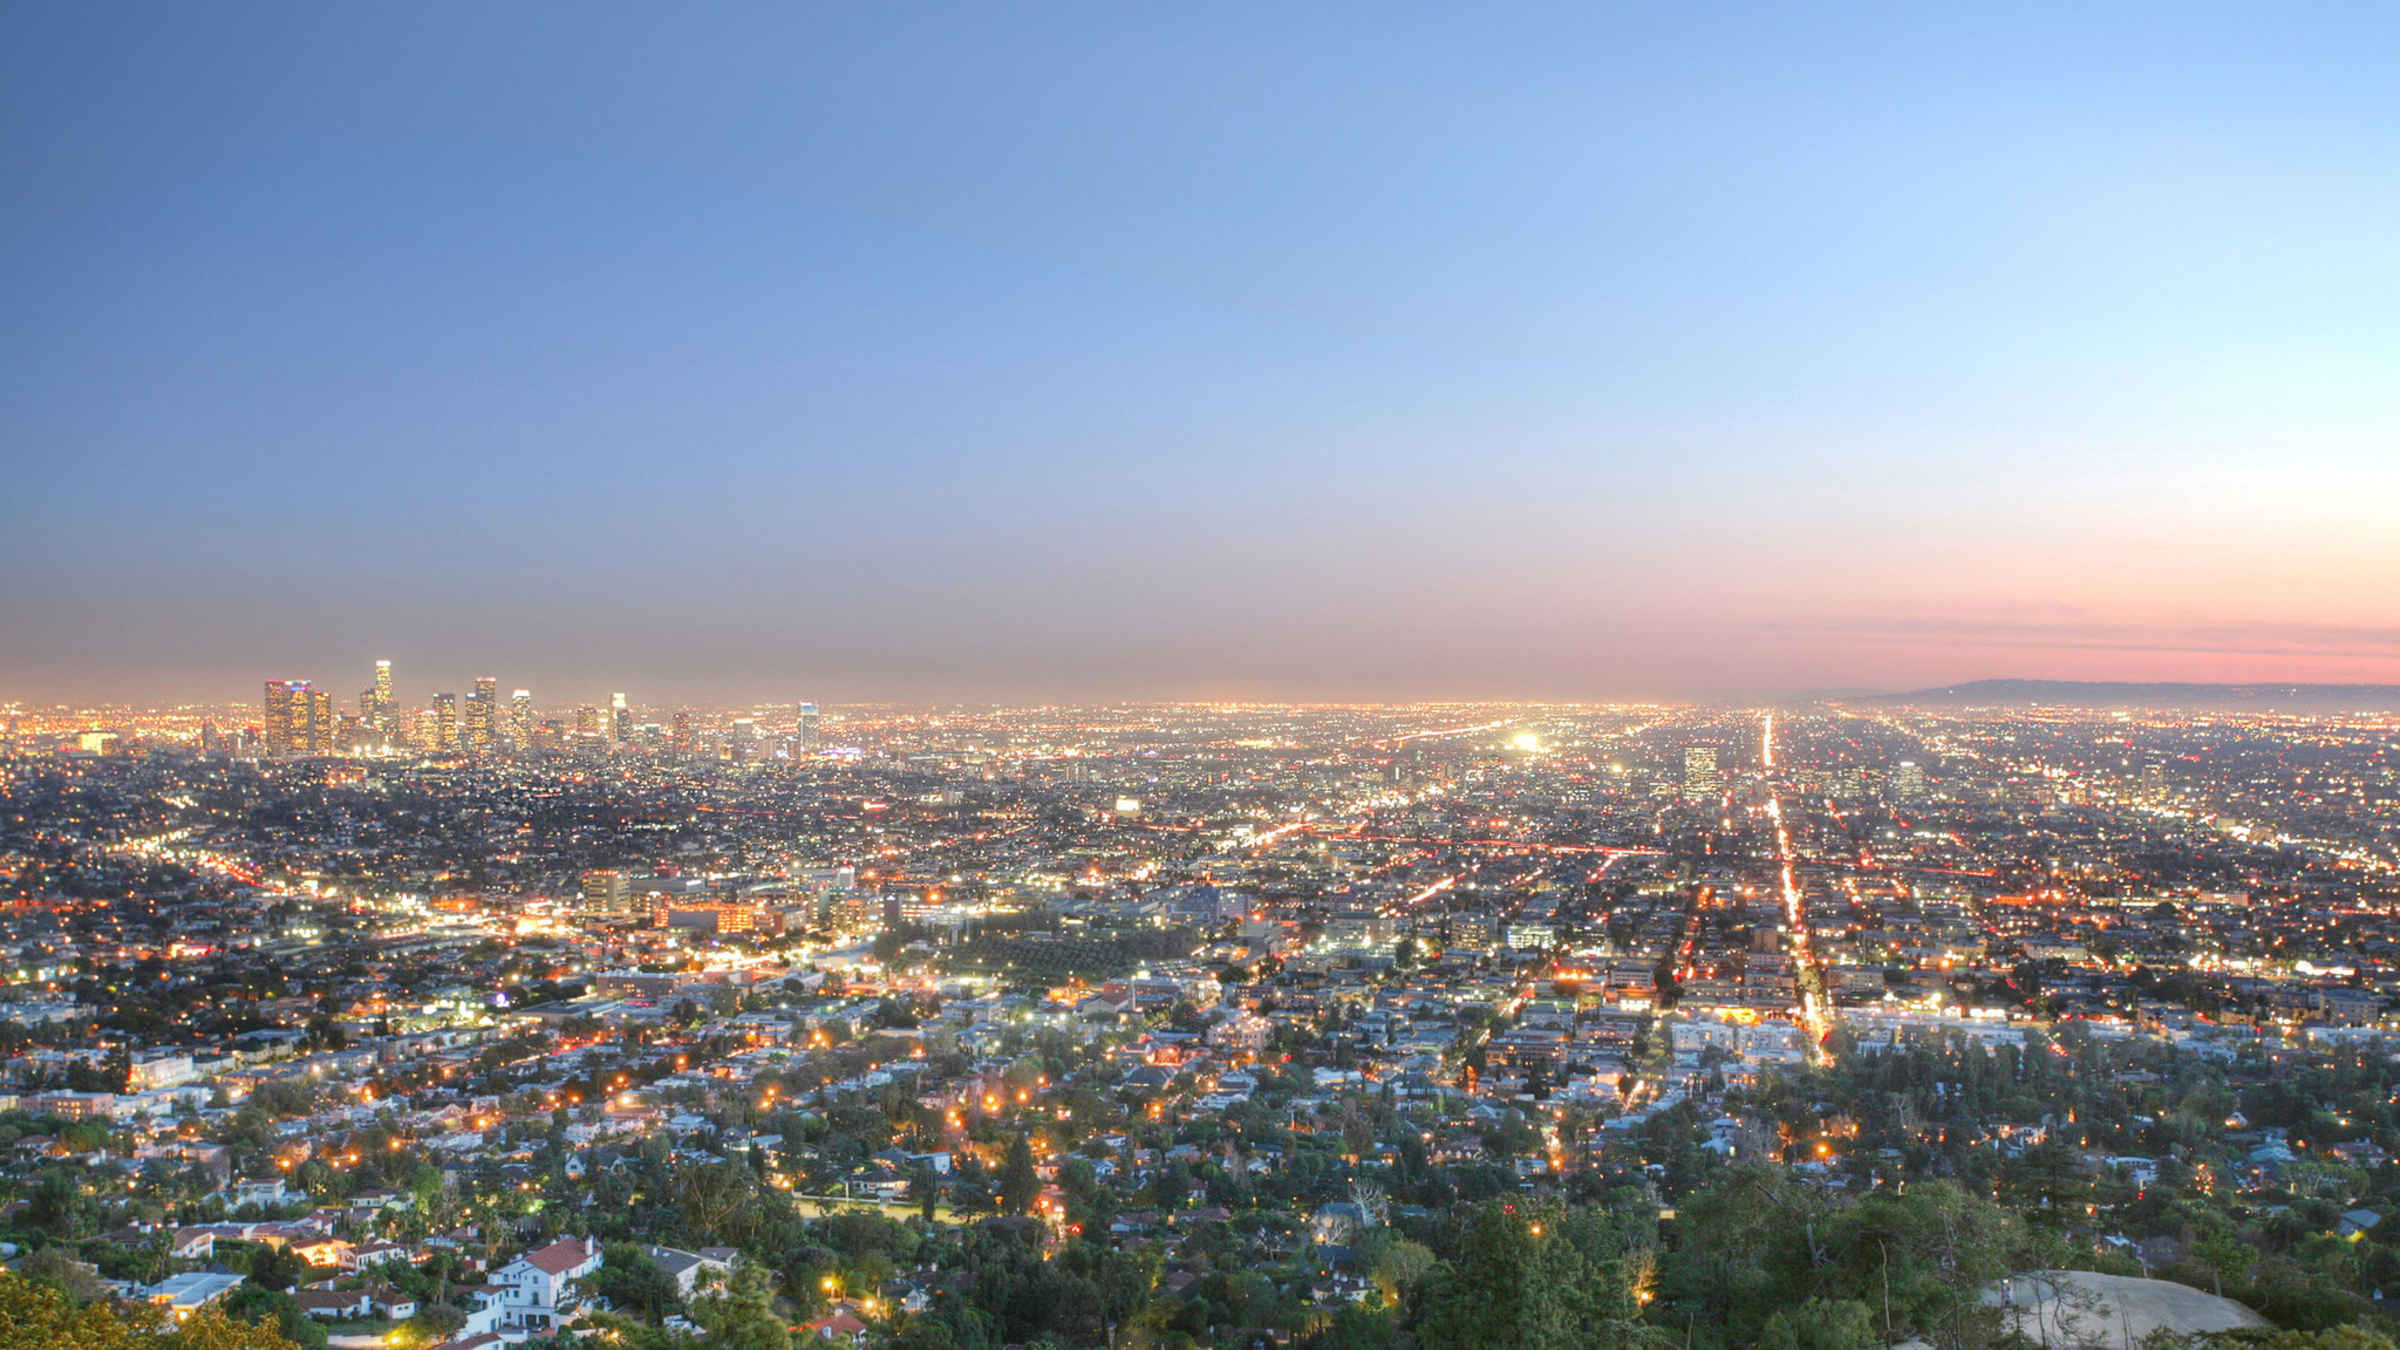 Top Los Angeles Tours, Tickets & Activities